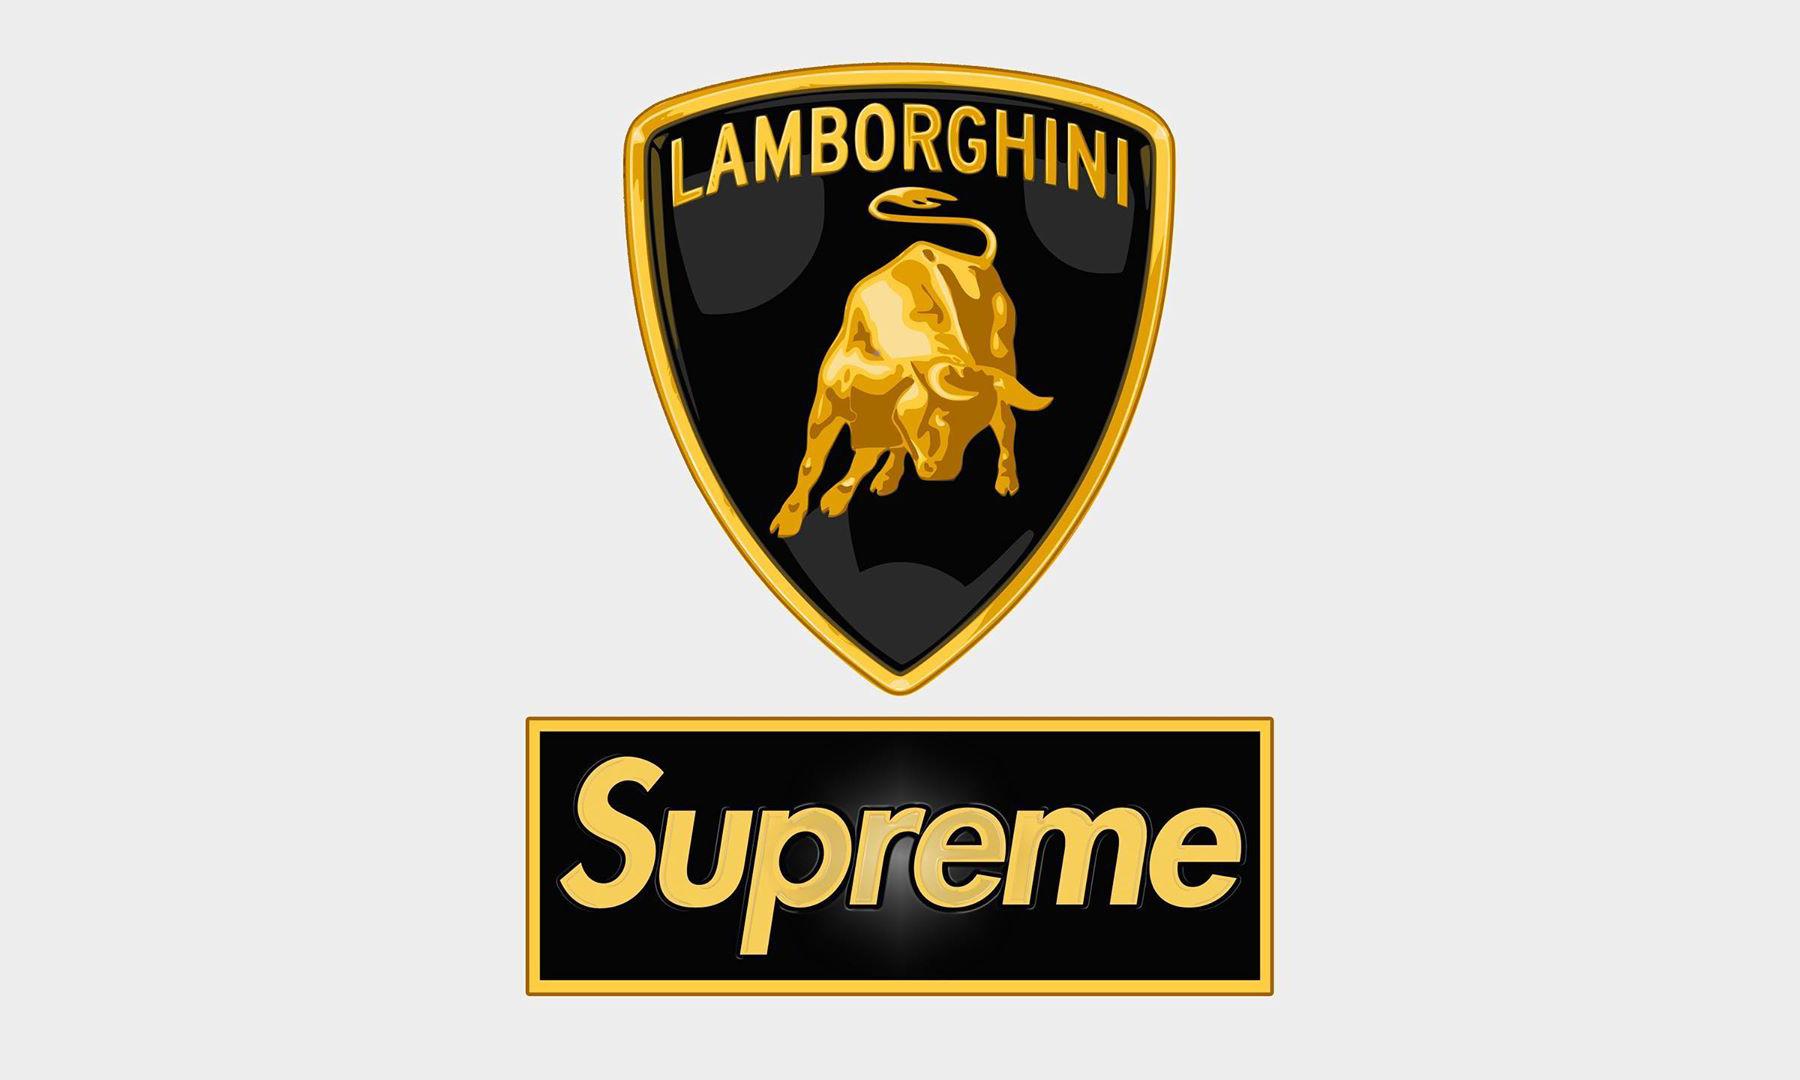 兰博基尼 x Supreme 联名系列即将公开